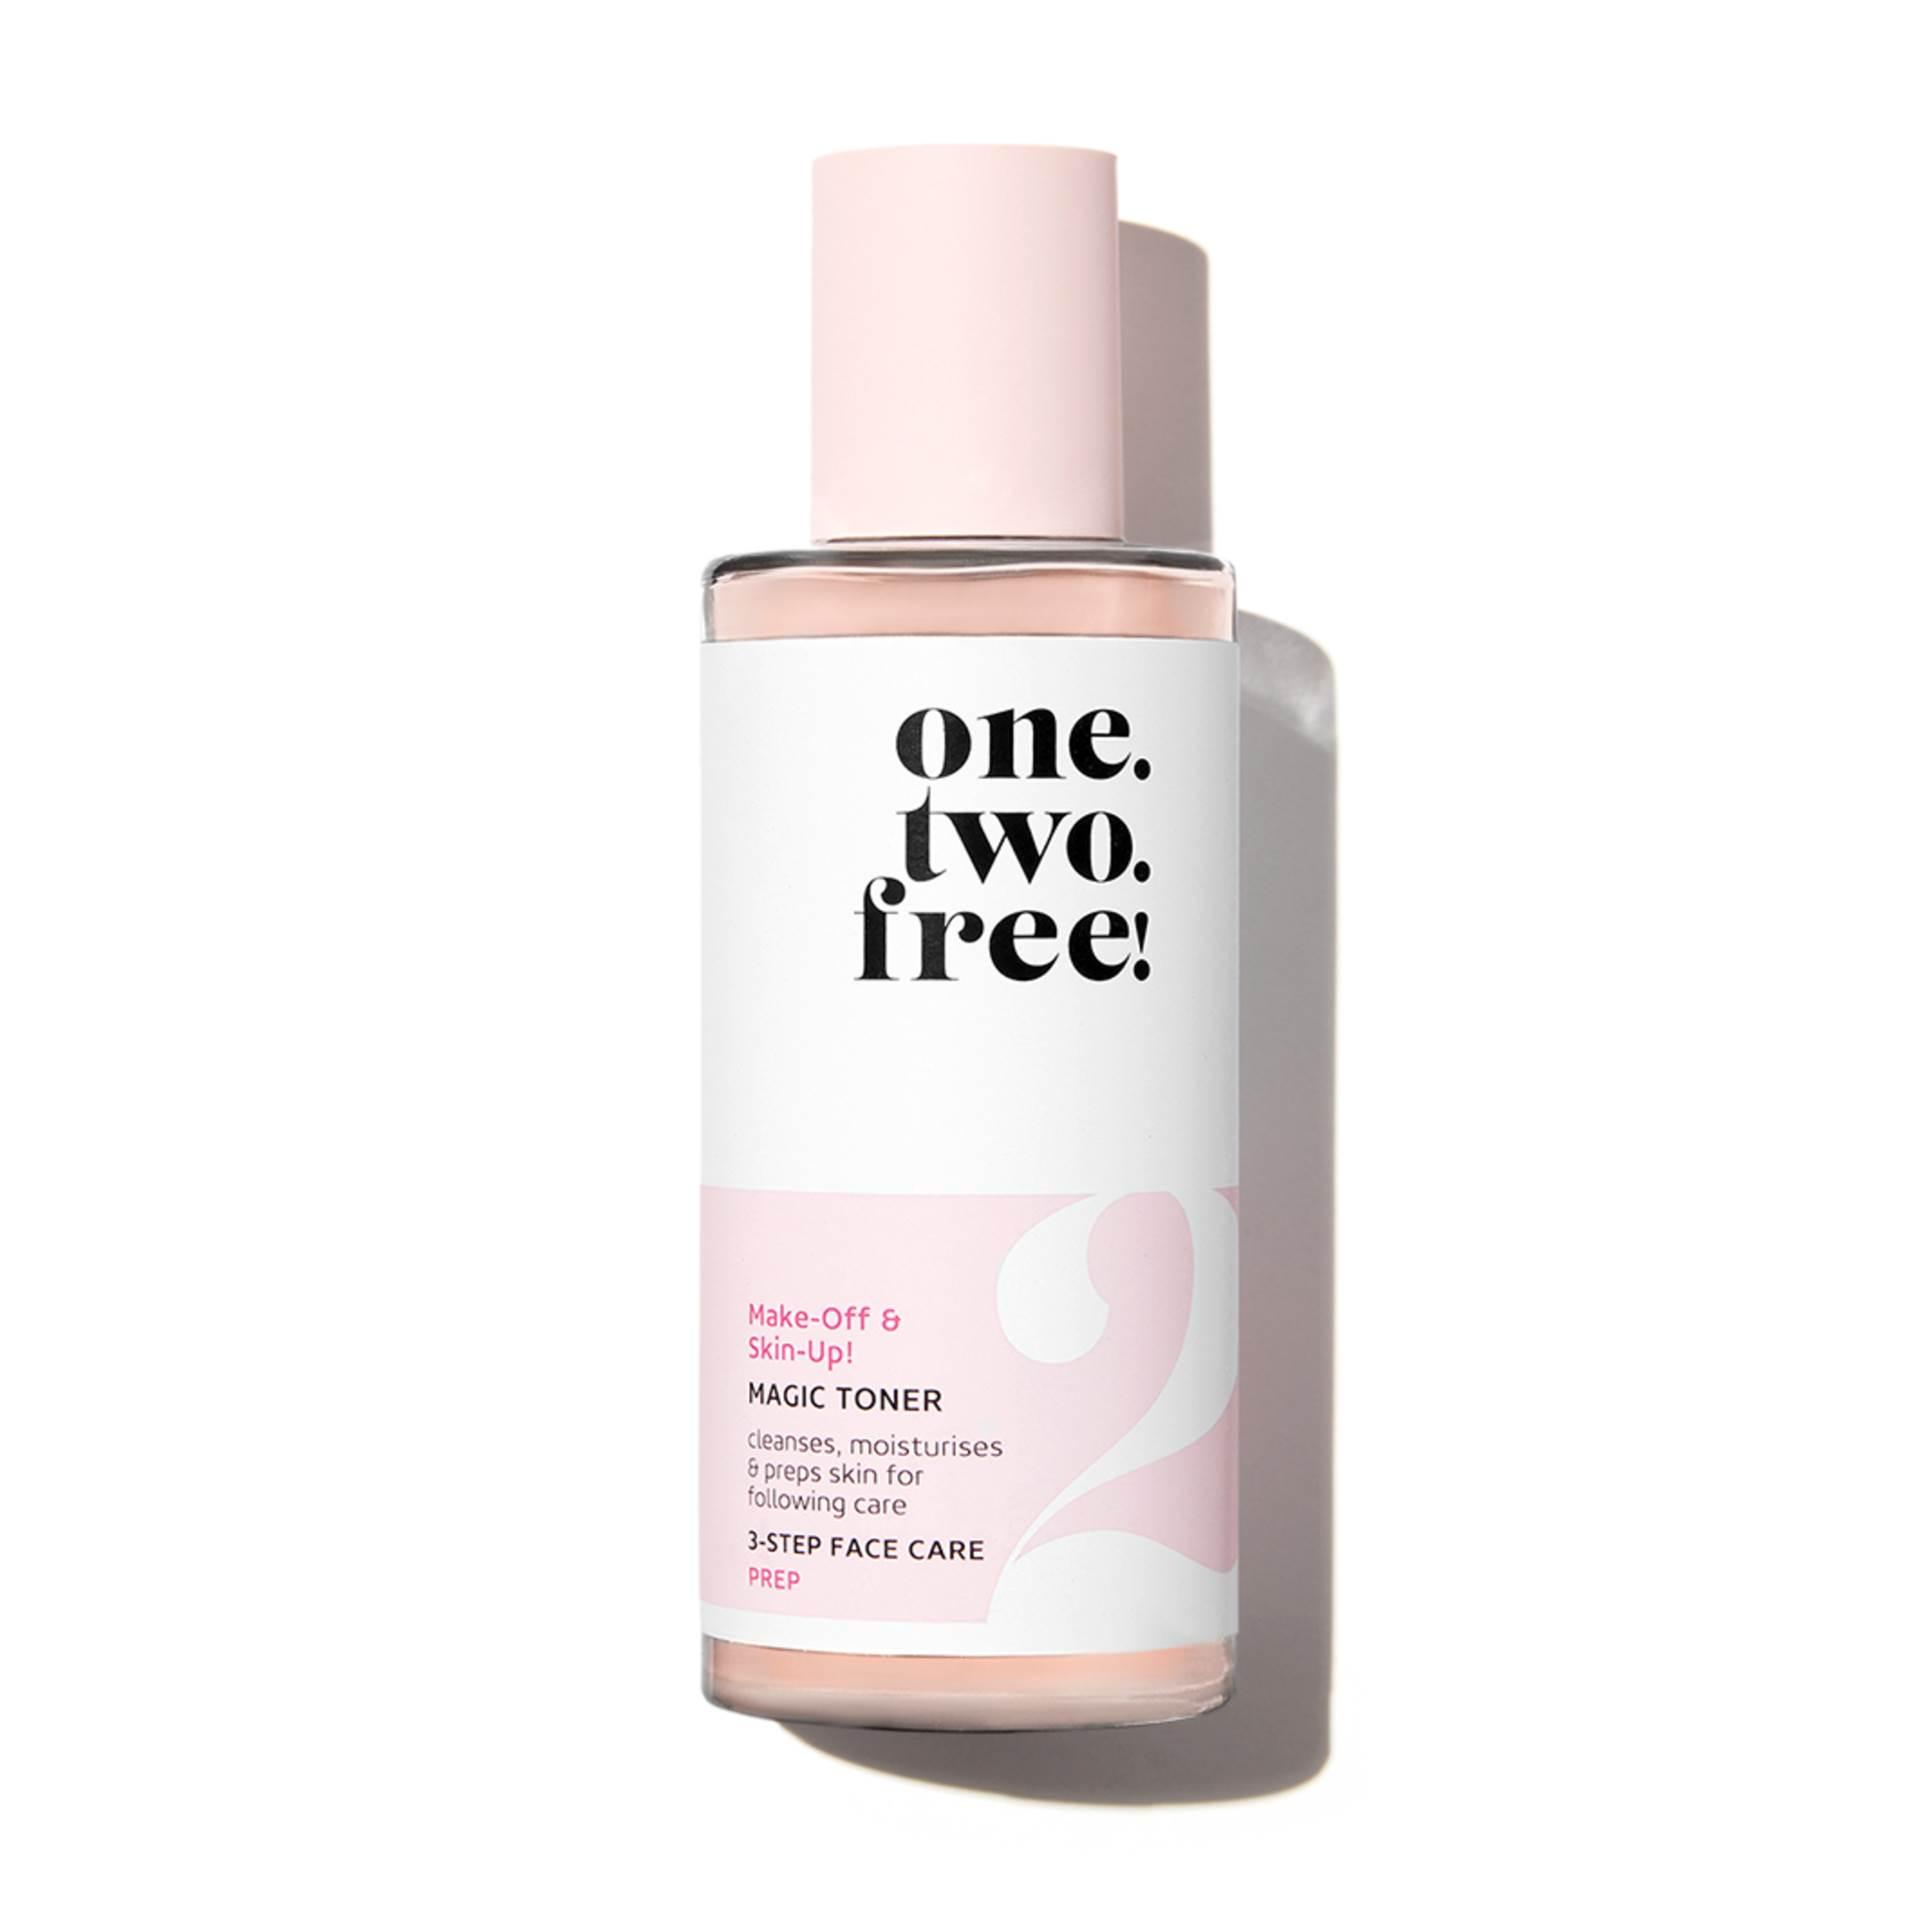 one.two.free! Magic Toner, 100 ml, 155 kn